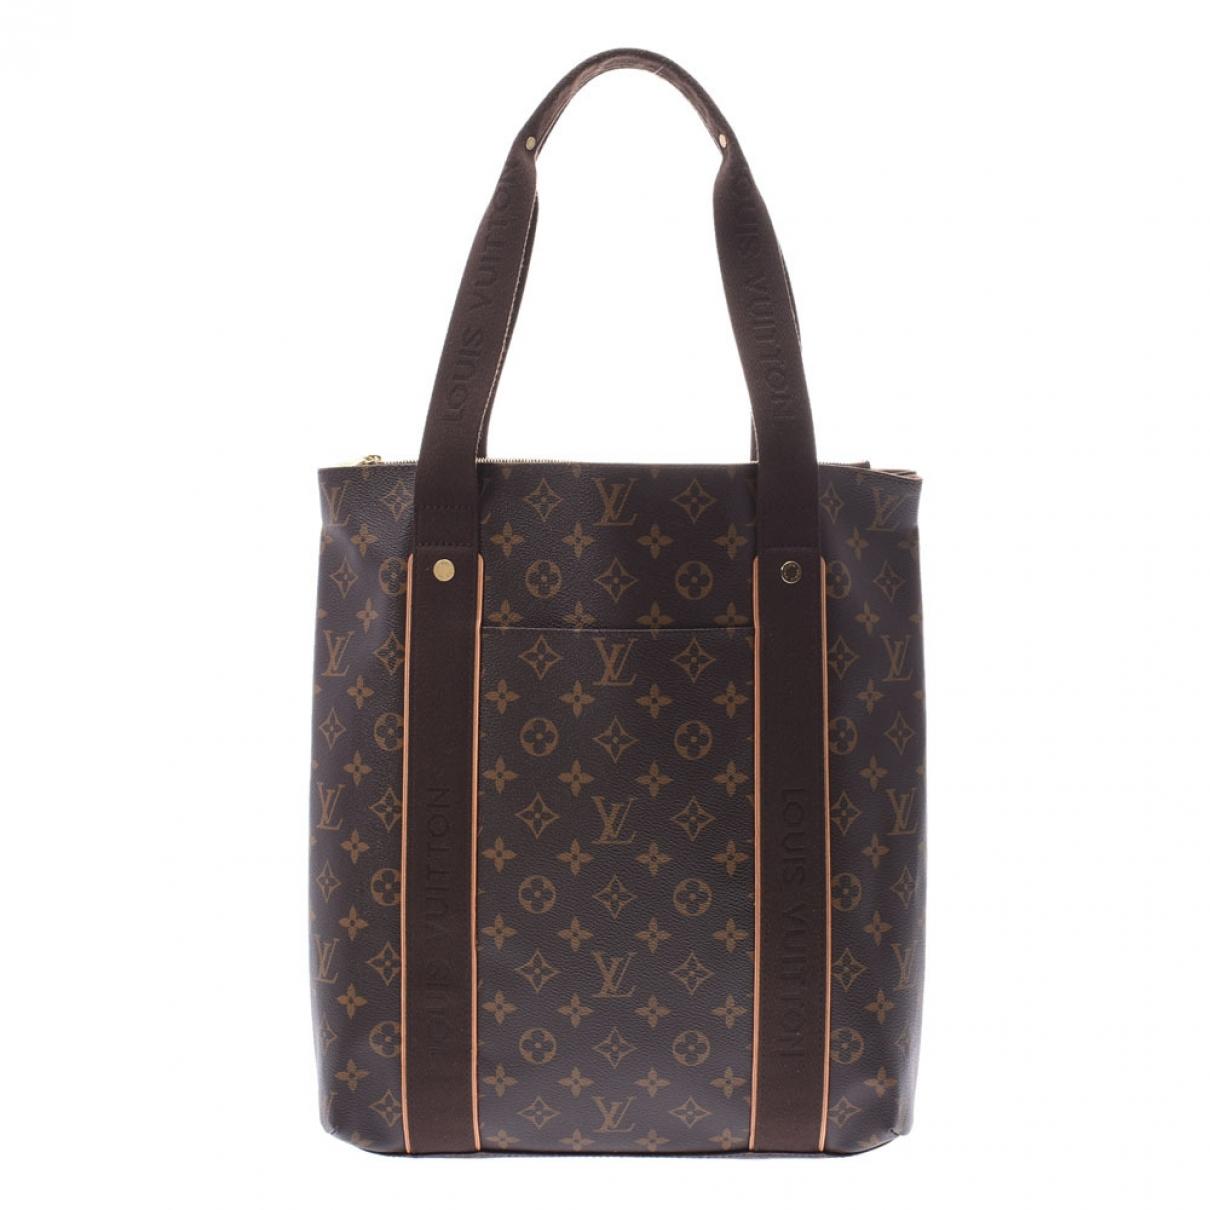 Bolso  Beaubourg de Lona Louis Vuitton